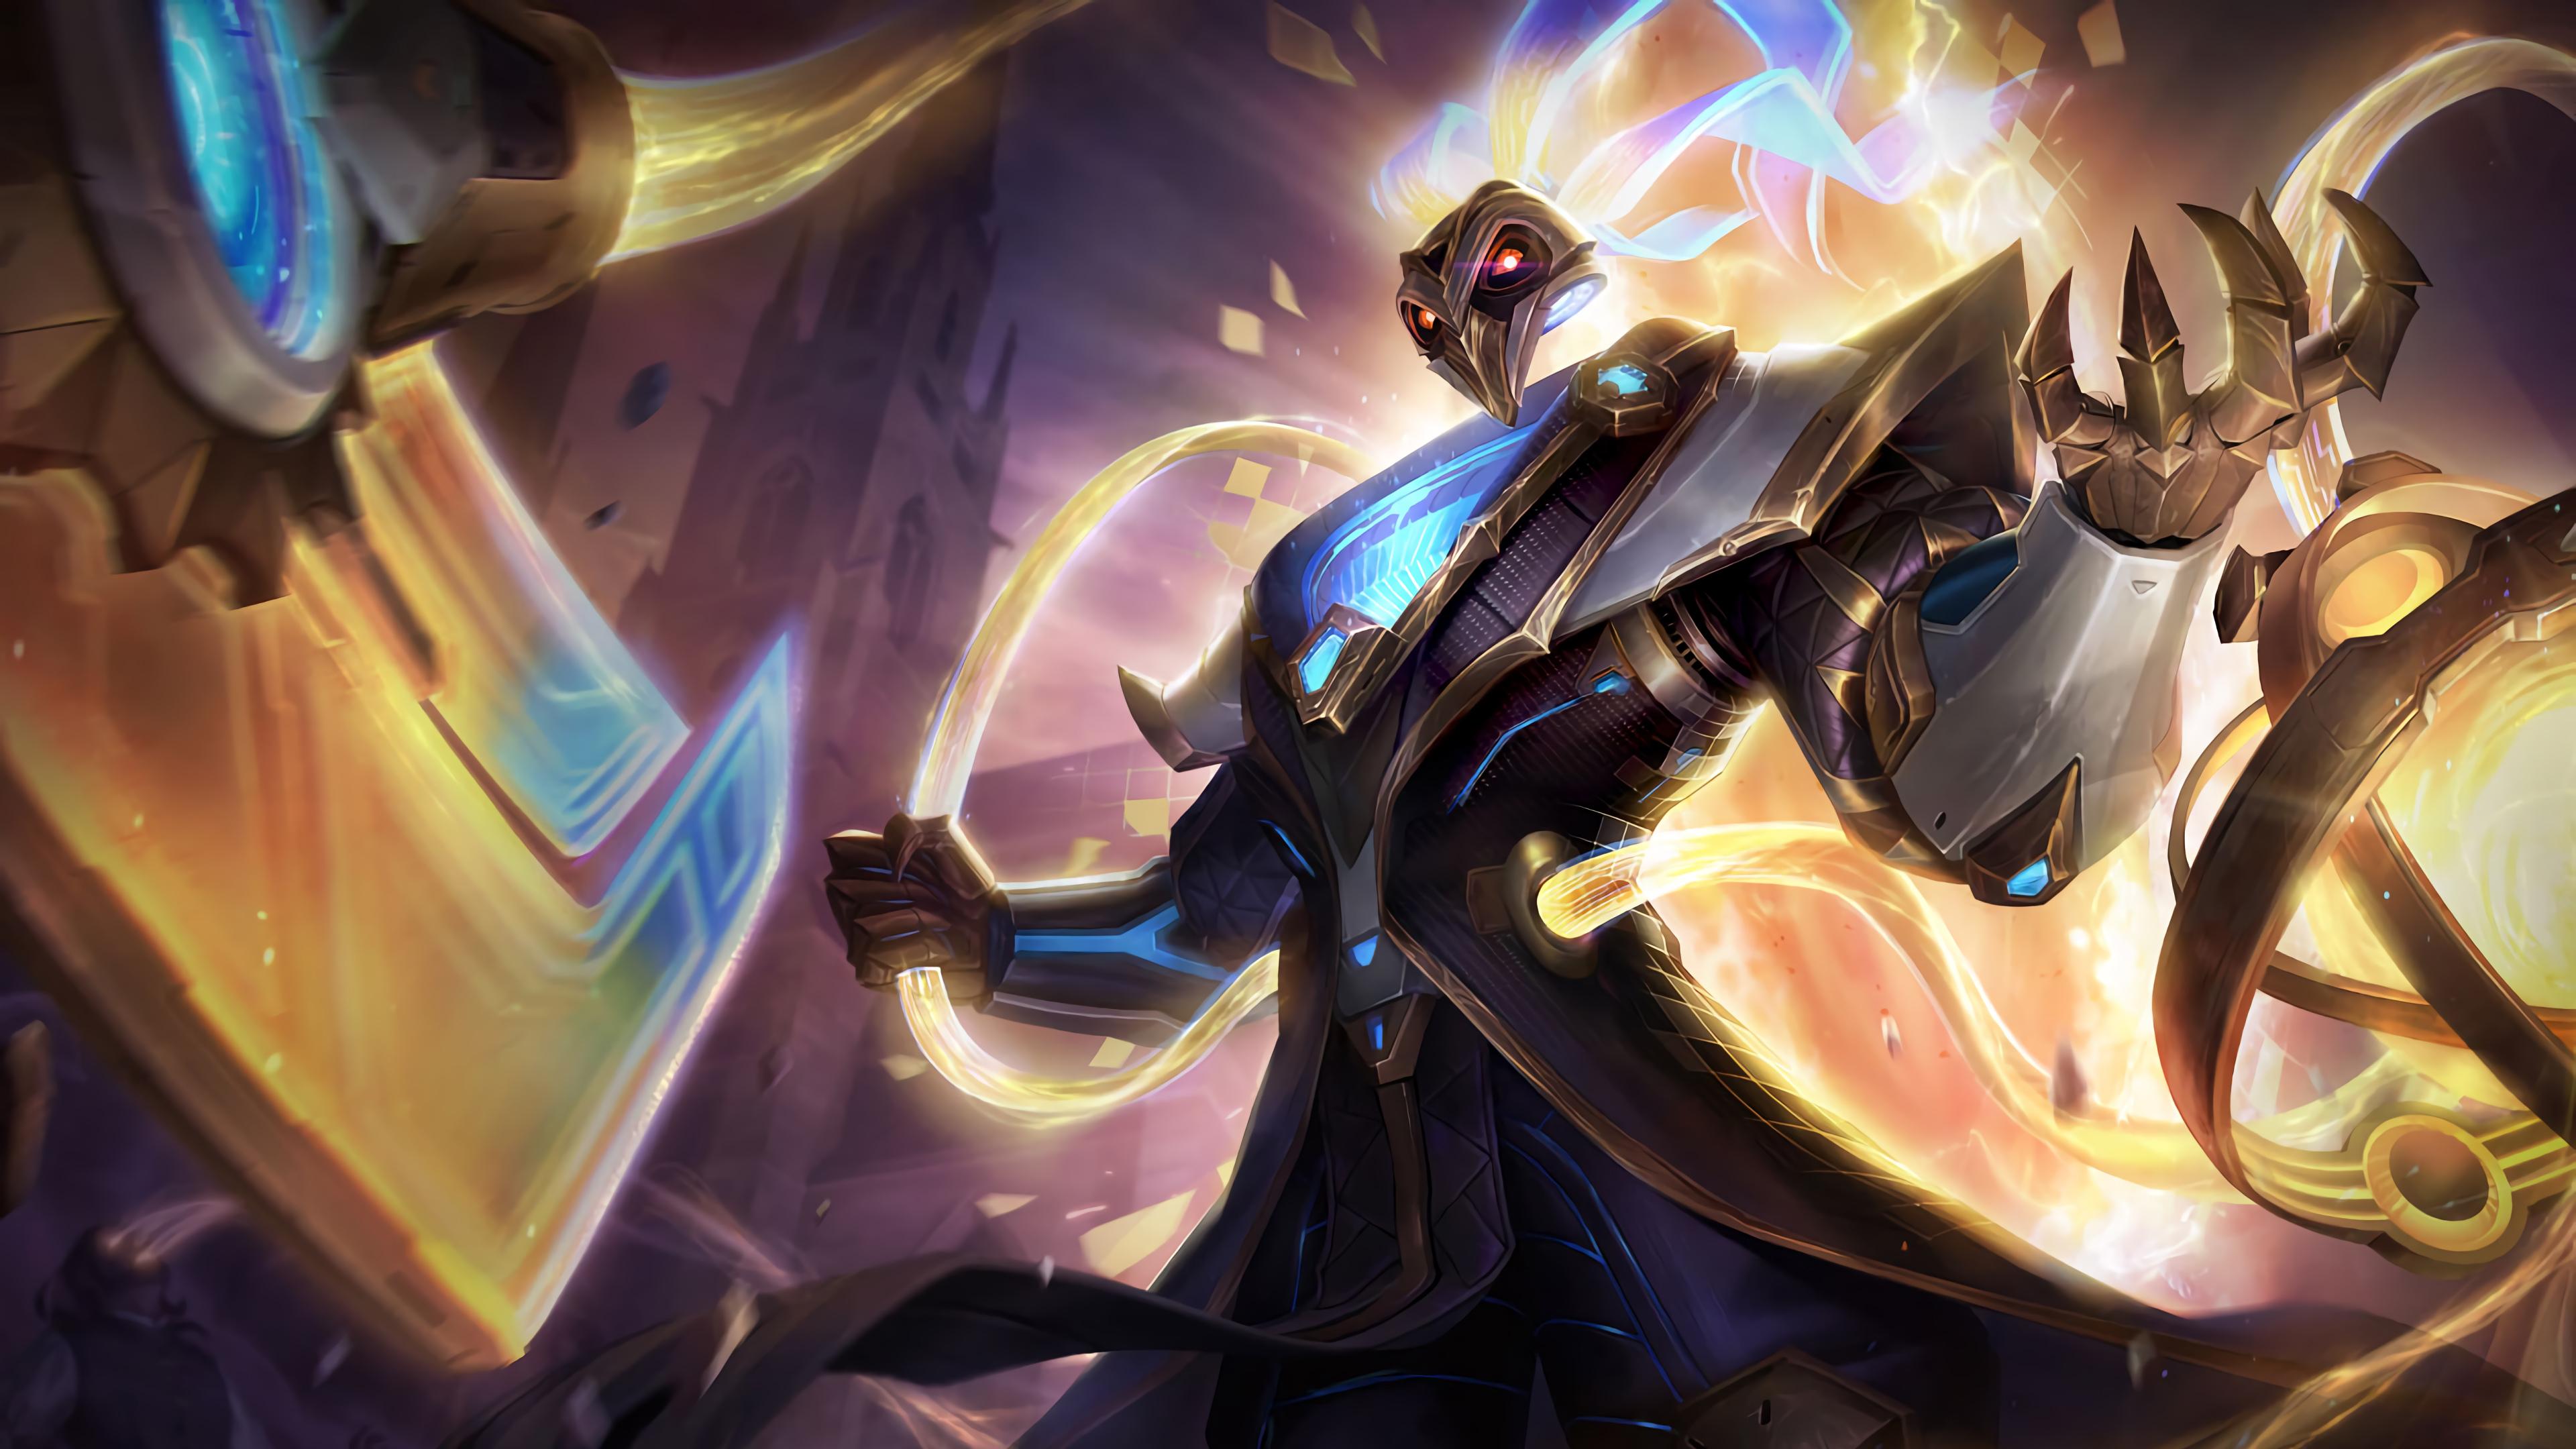 Wallpaper Fire The Prestige Thresh League Of Legends League